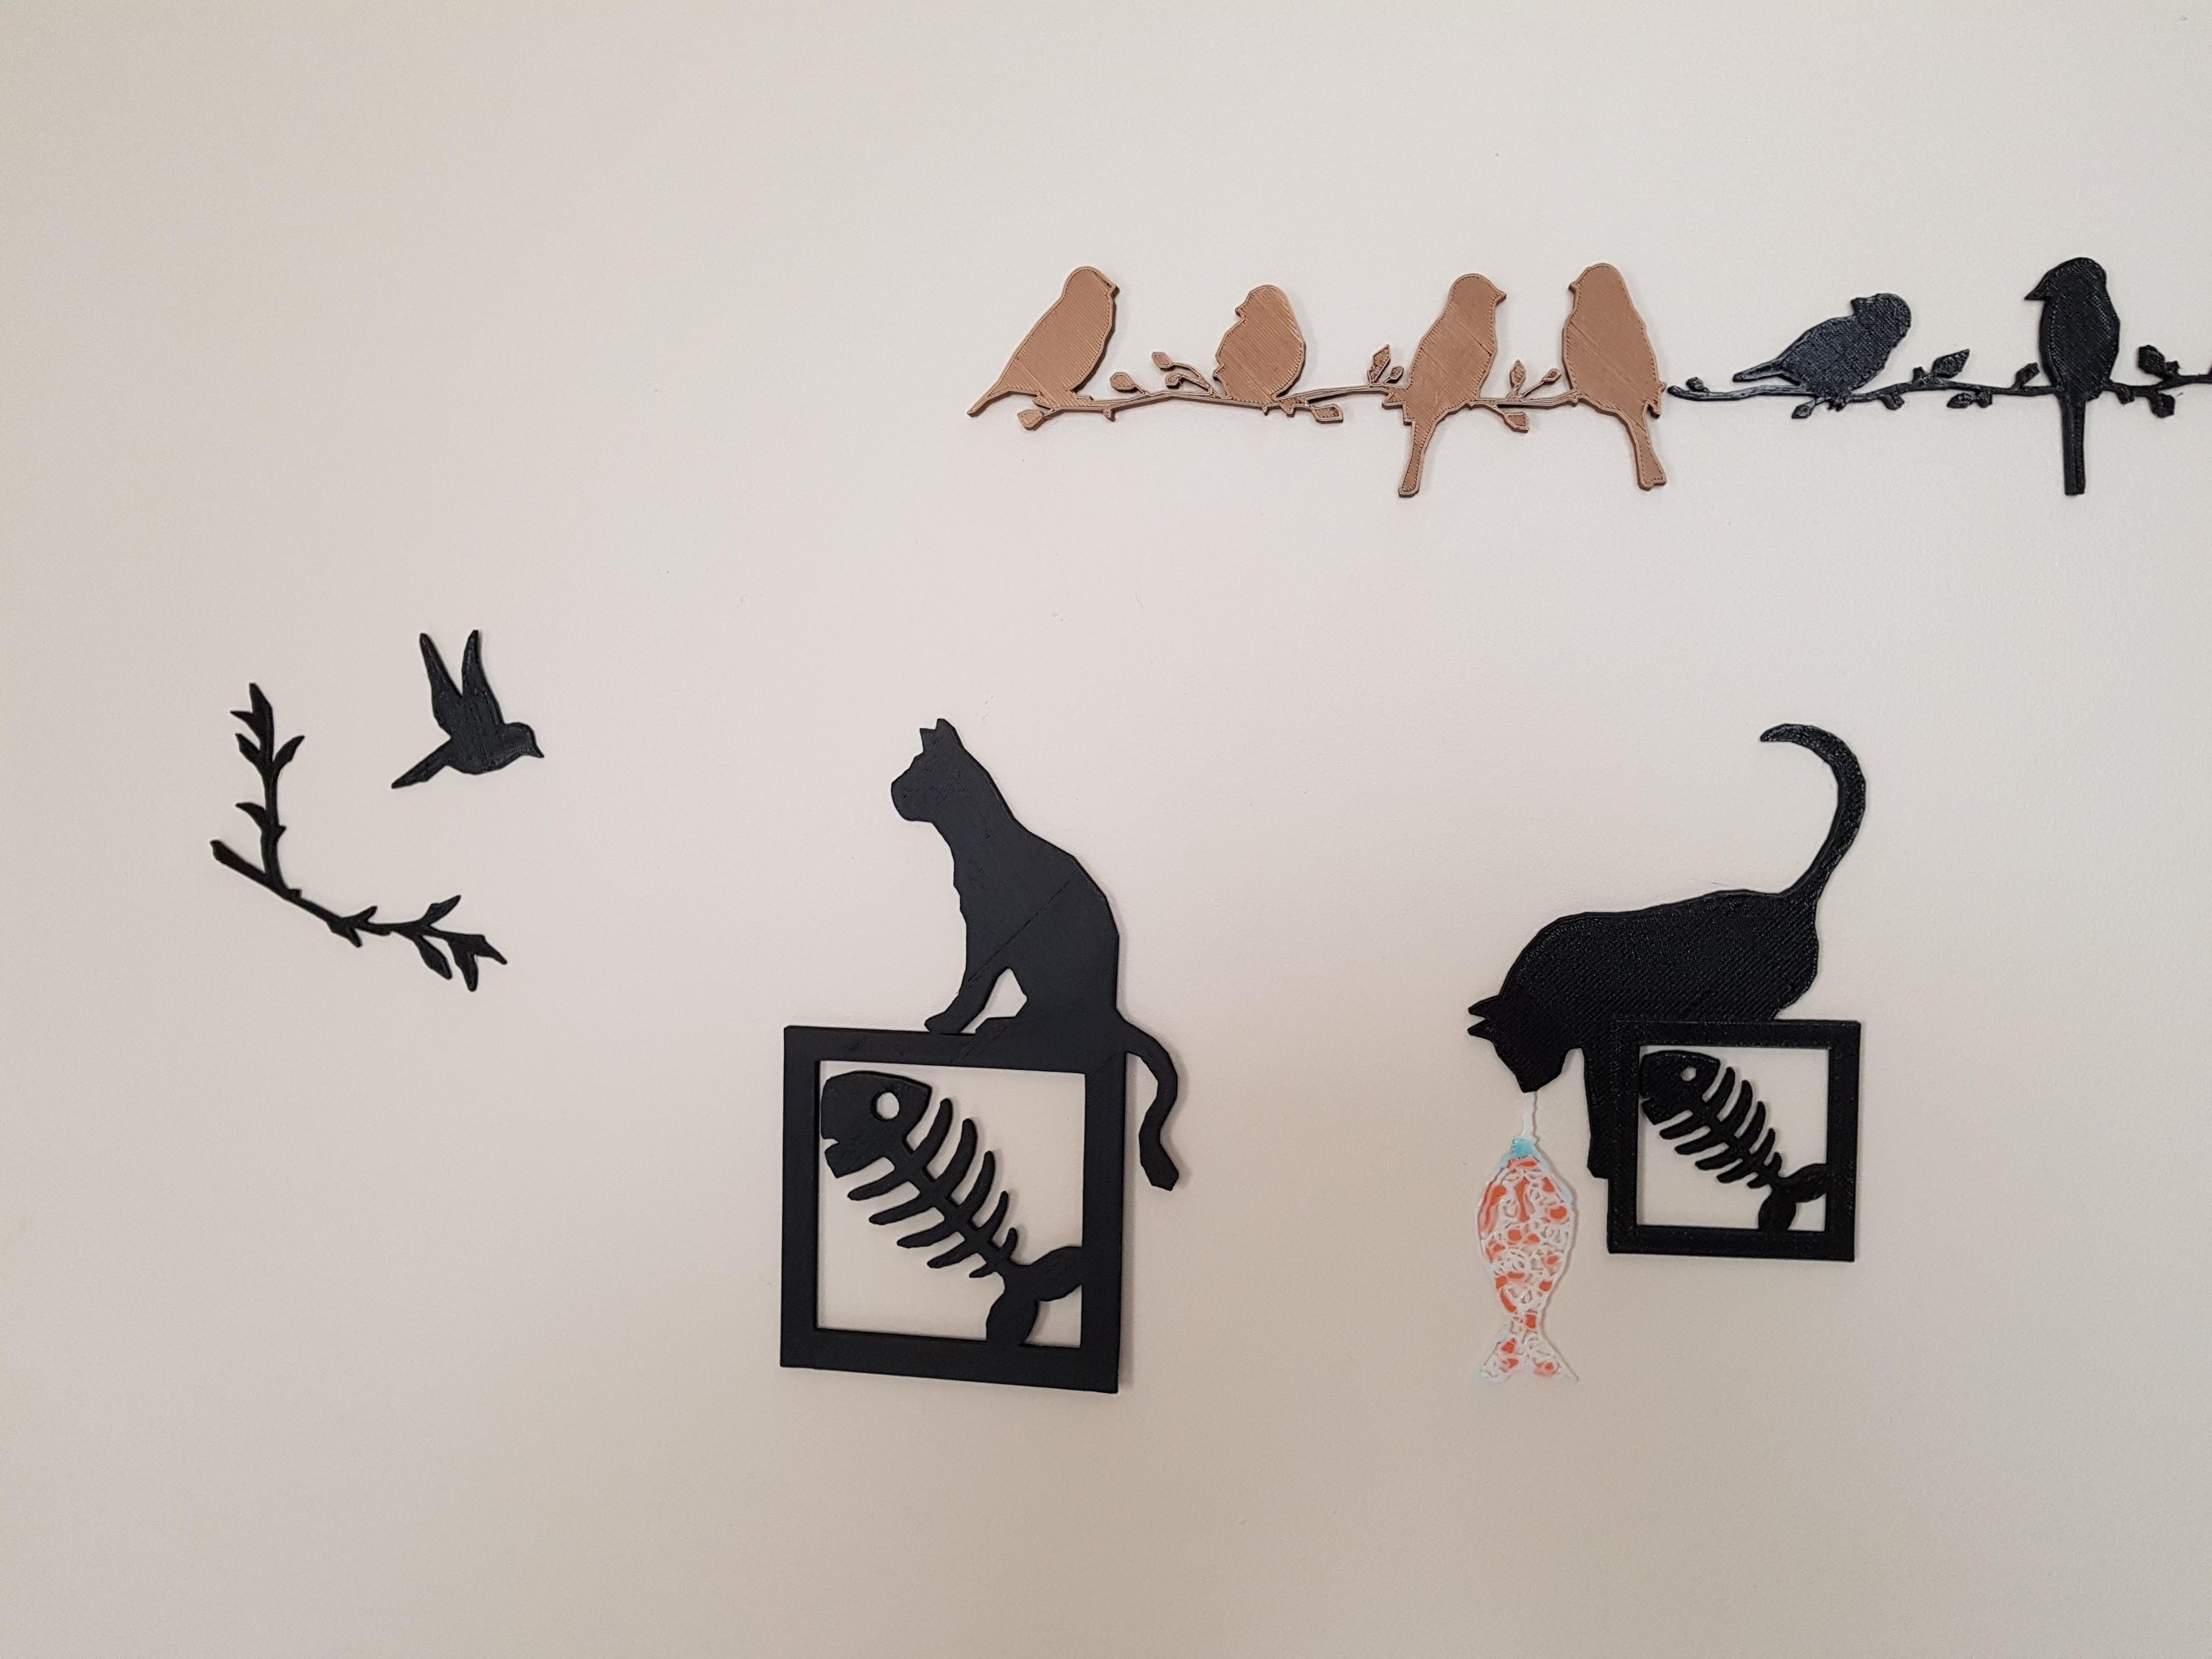 20180606_114953.jpg Download STL file cat pictures • 3D printable model, catf3d